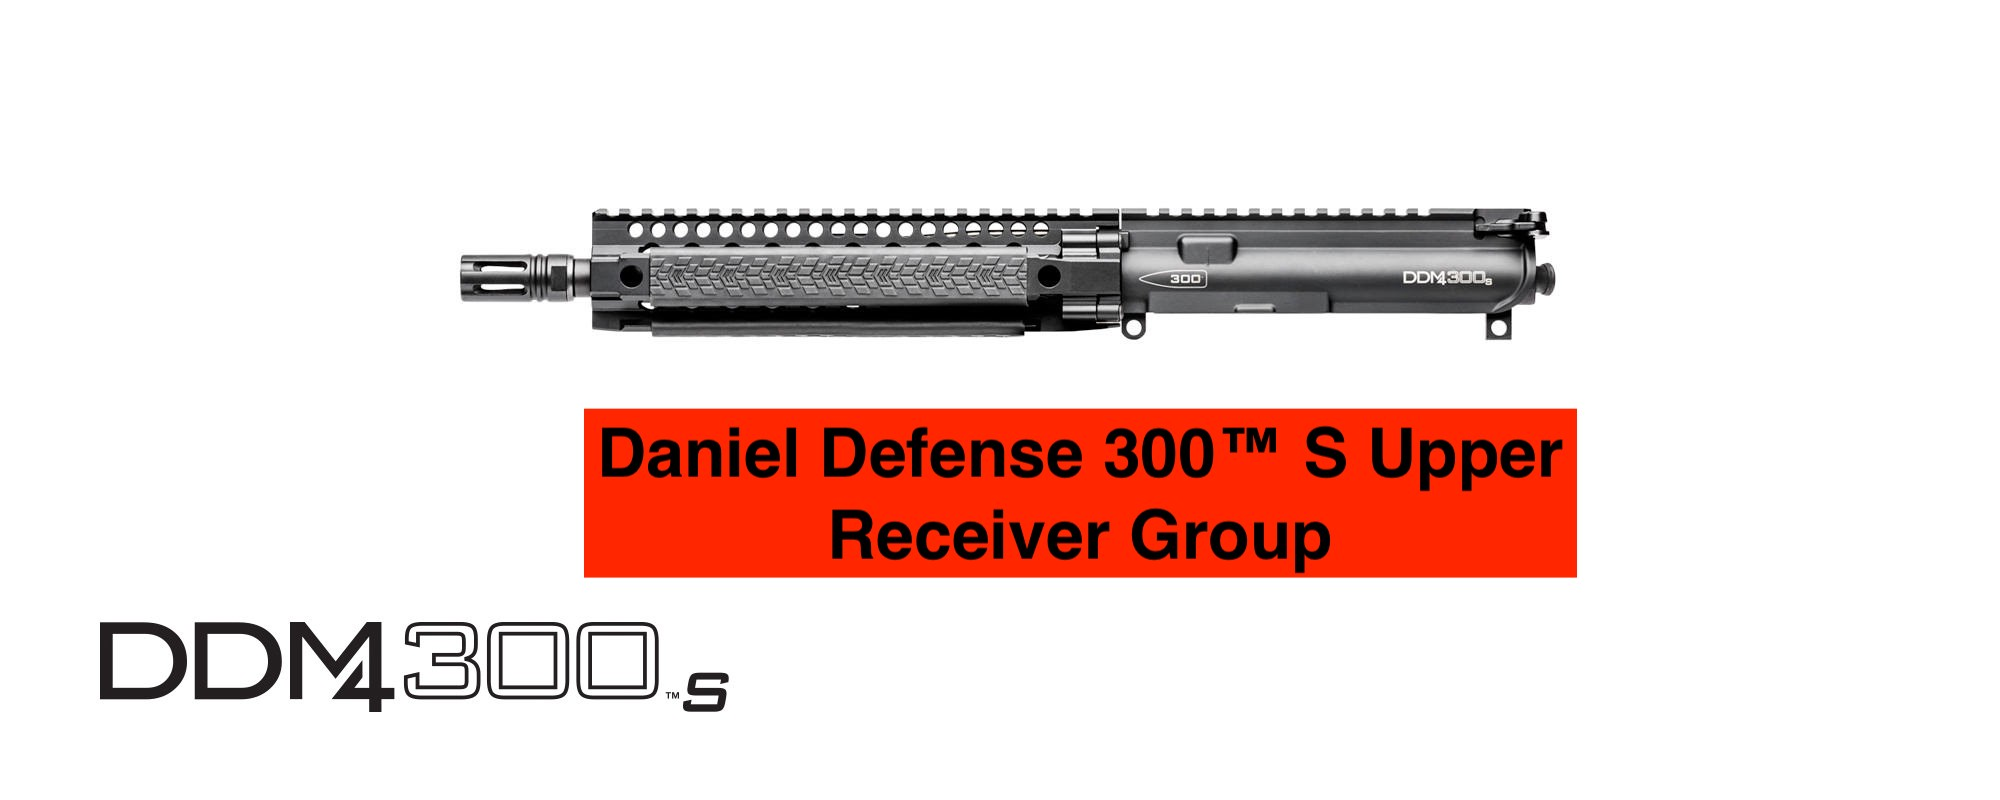 Daniel Defense 300™ S Upper Receiver Group